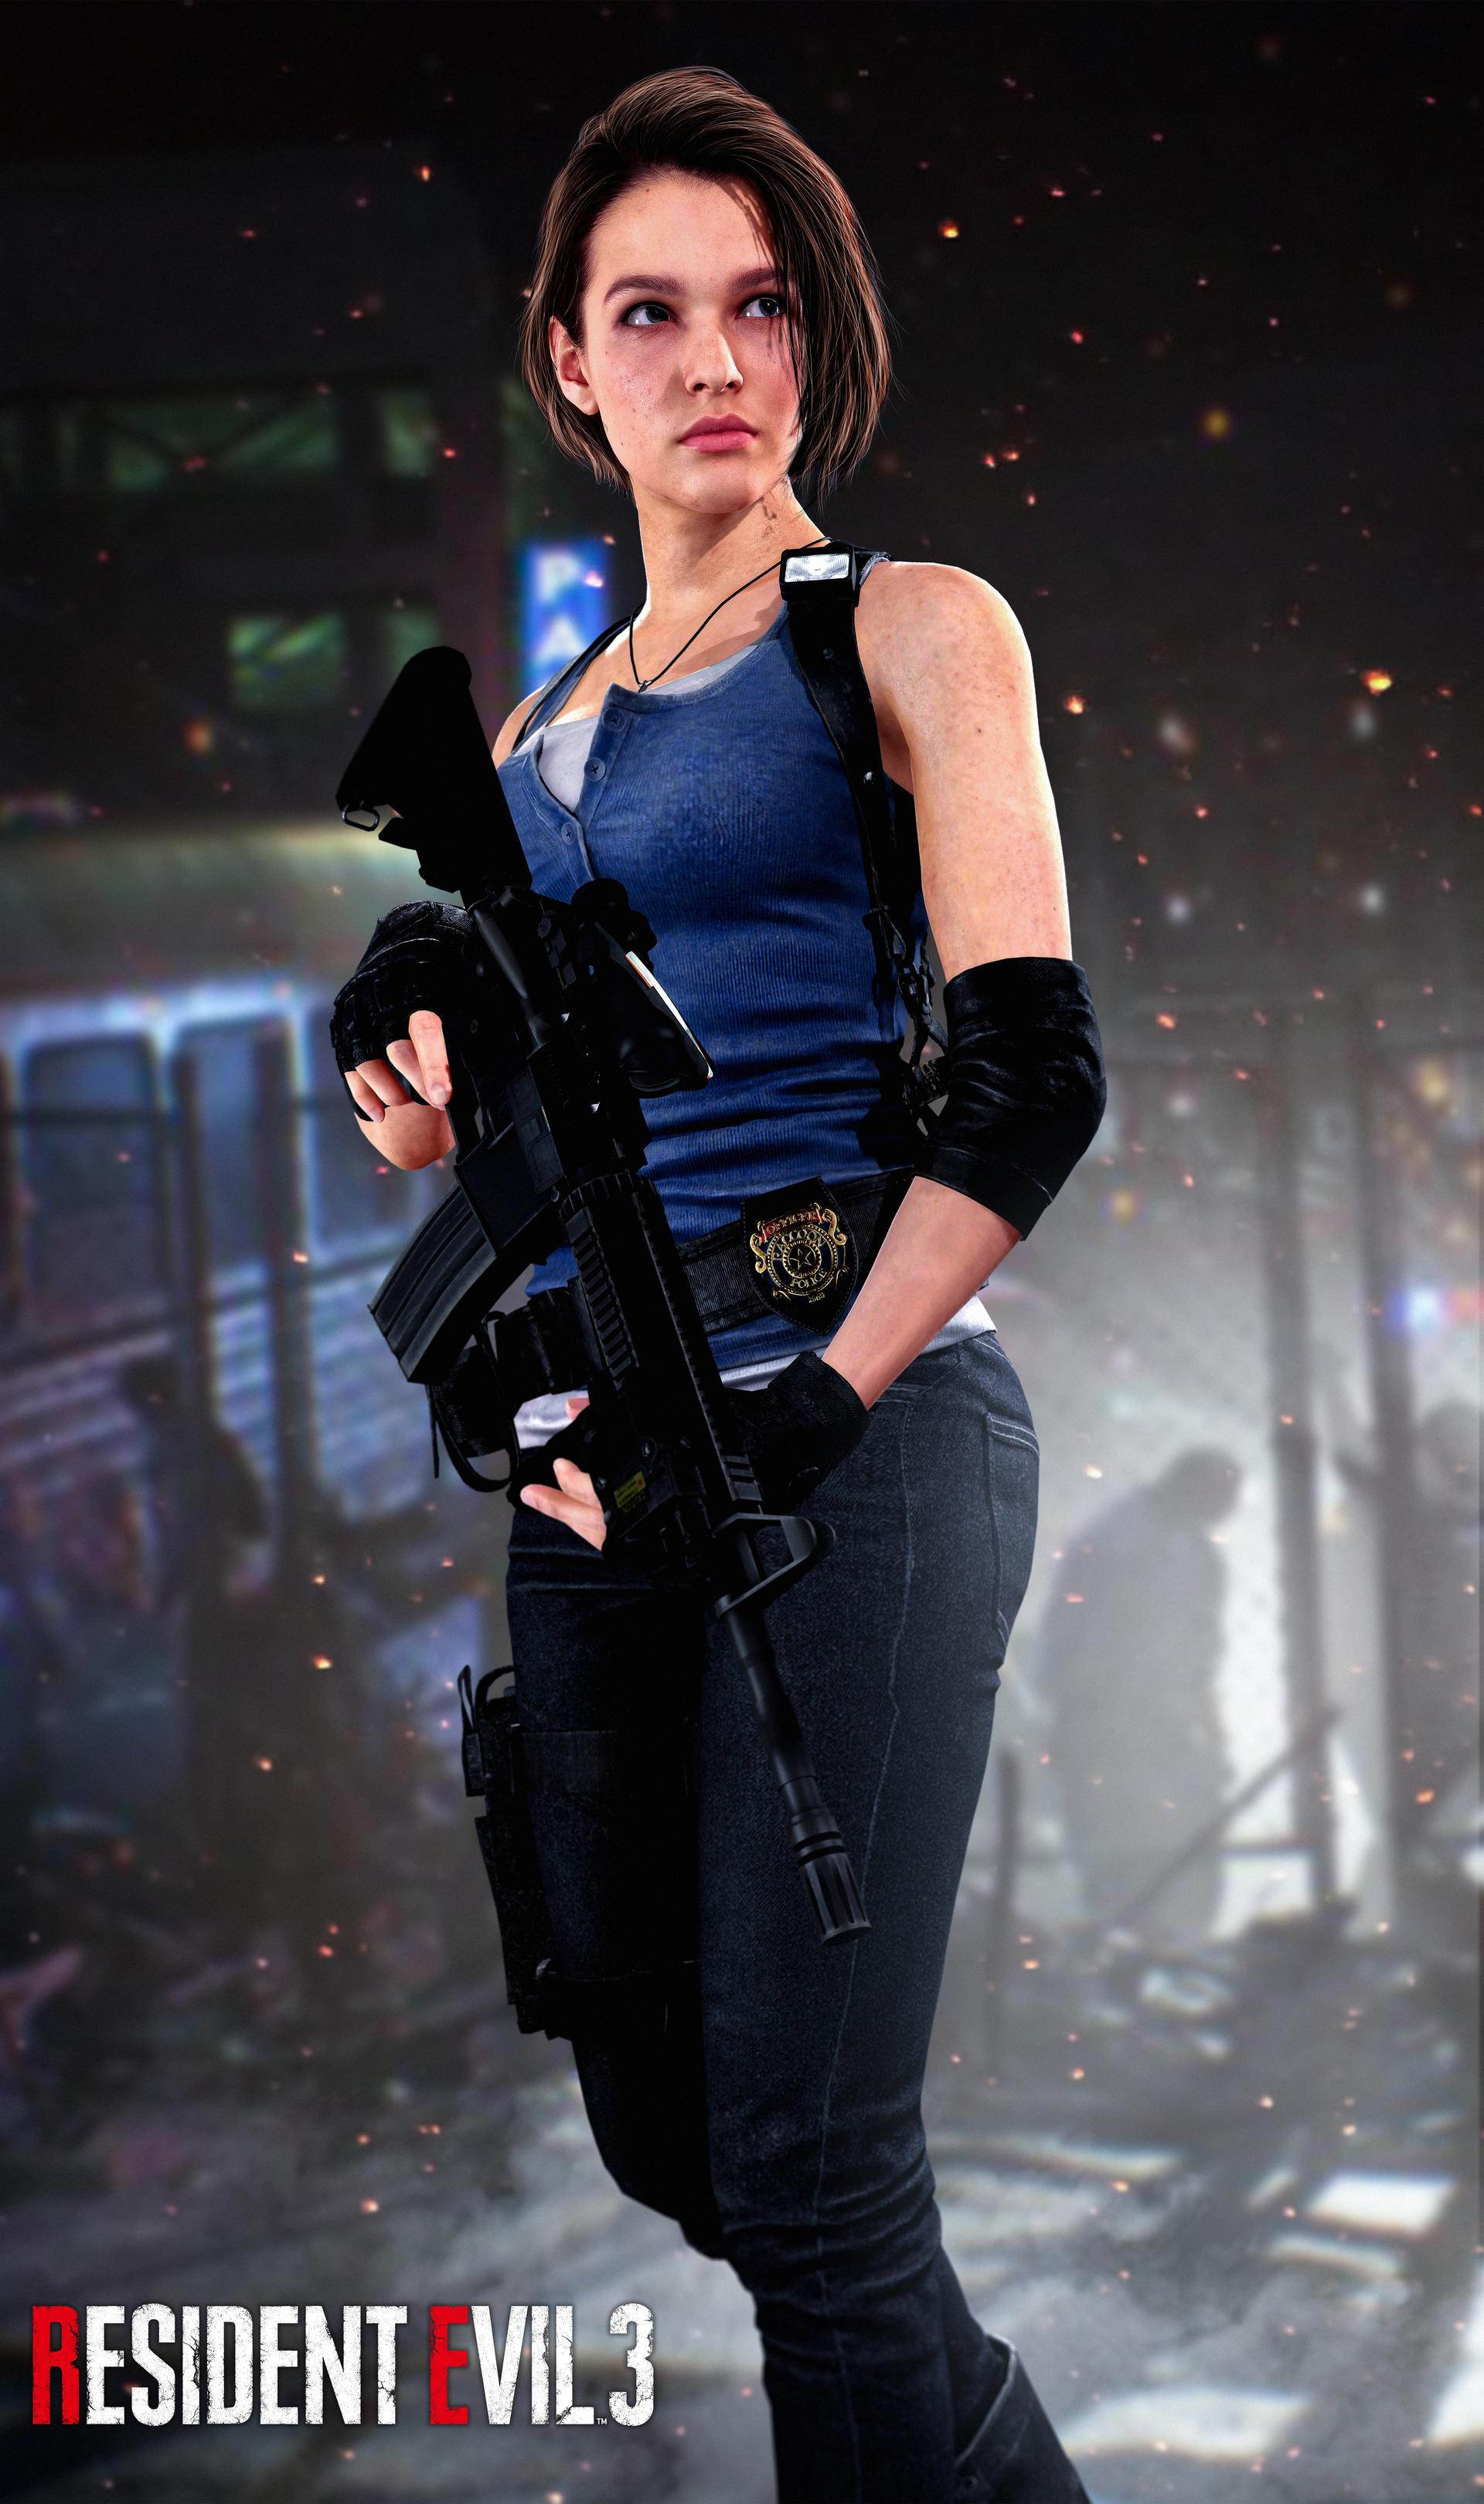 Resident Evil 3 Remake - Jill Valentine Classic - YouTube